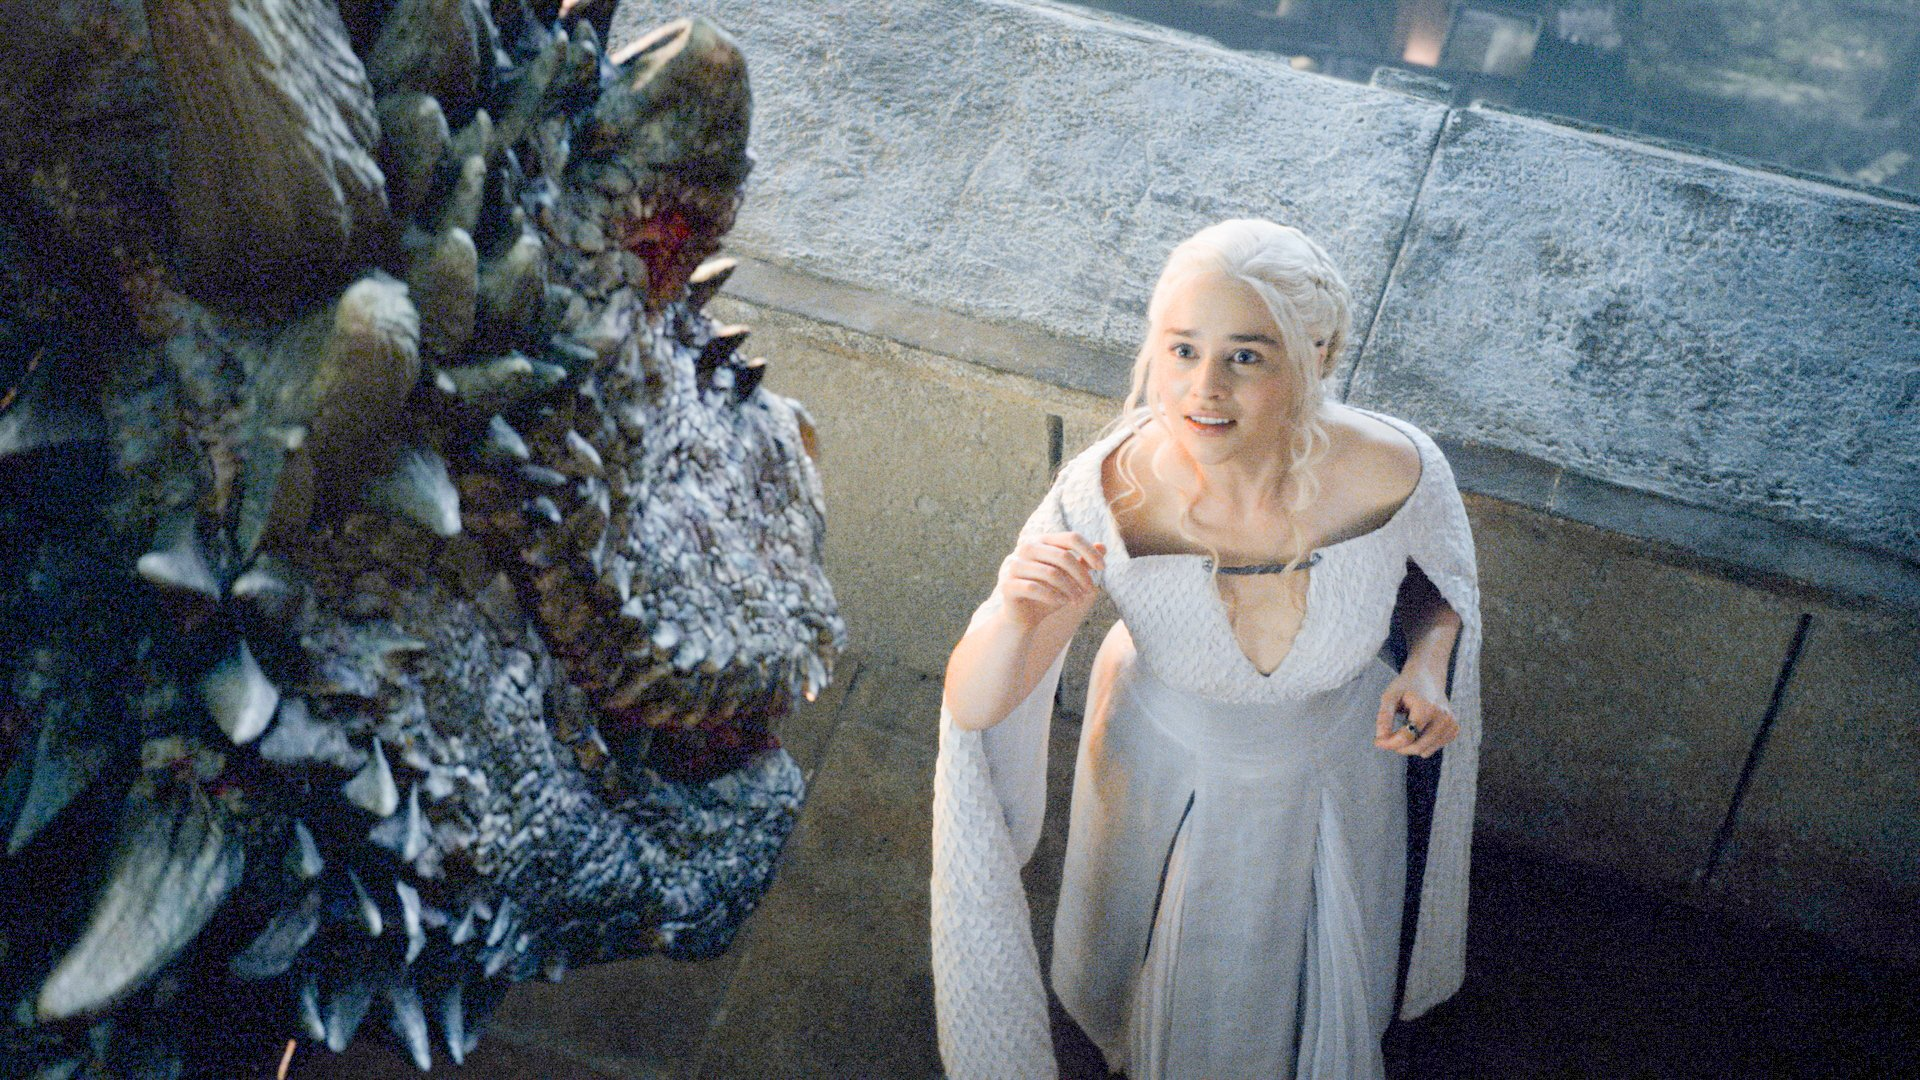 GAME OF THRONES talvez tenha só mais 13 episódios após a sexta temporada